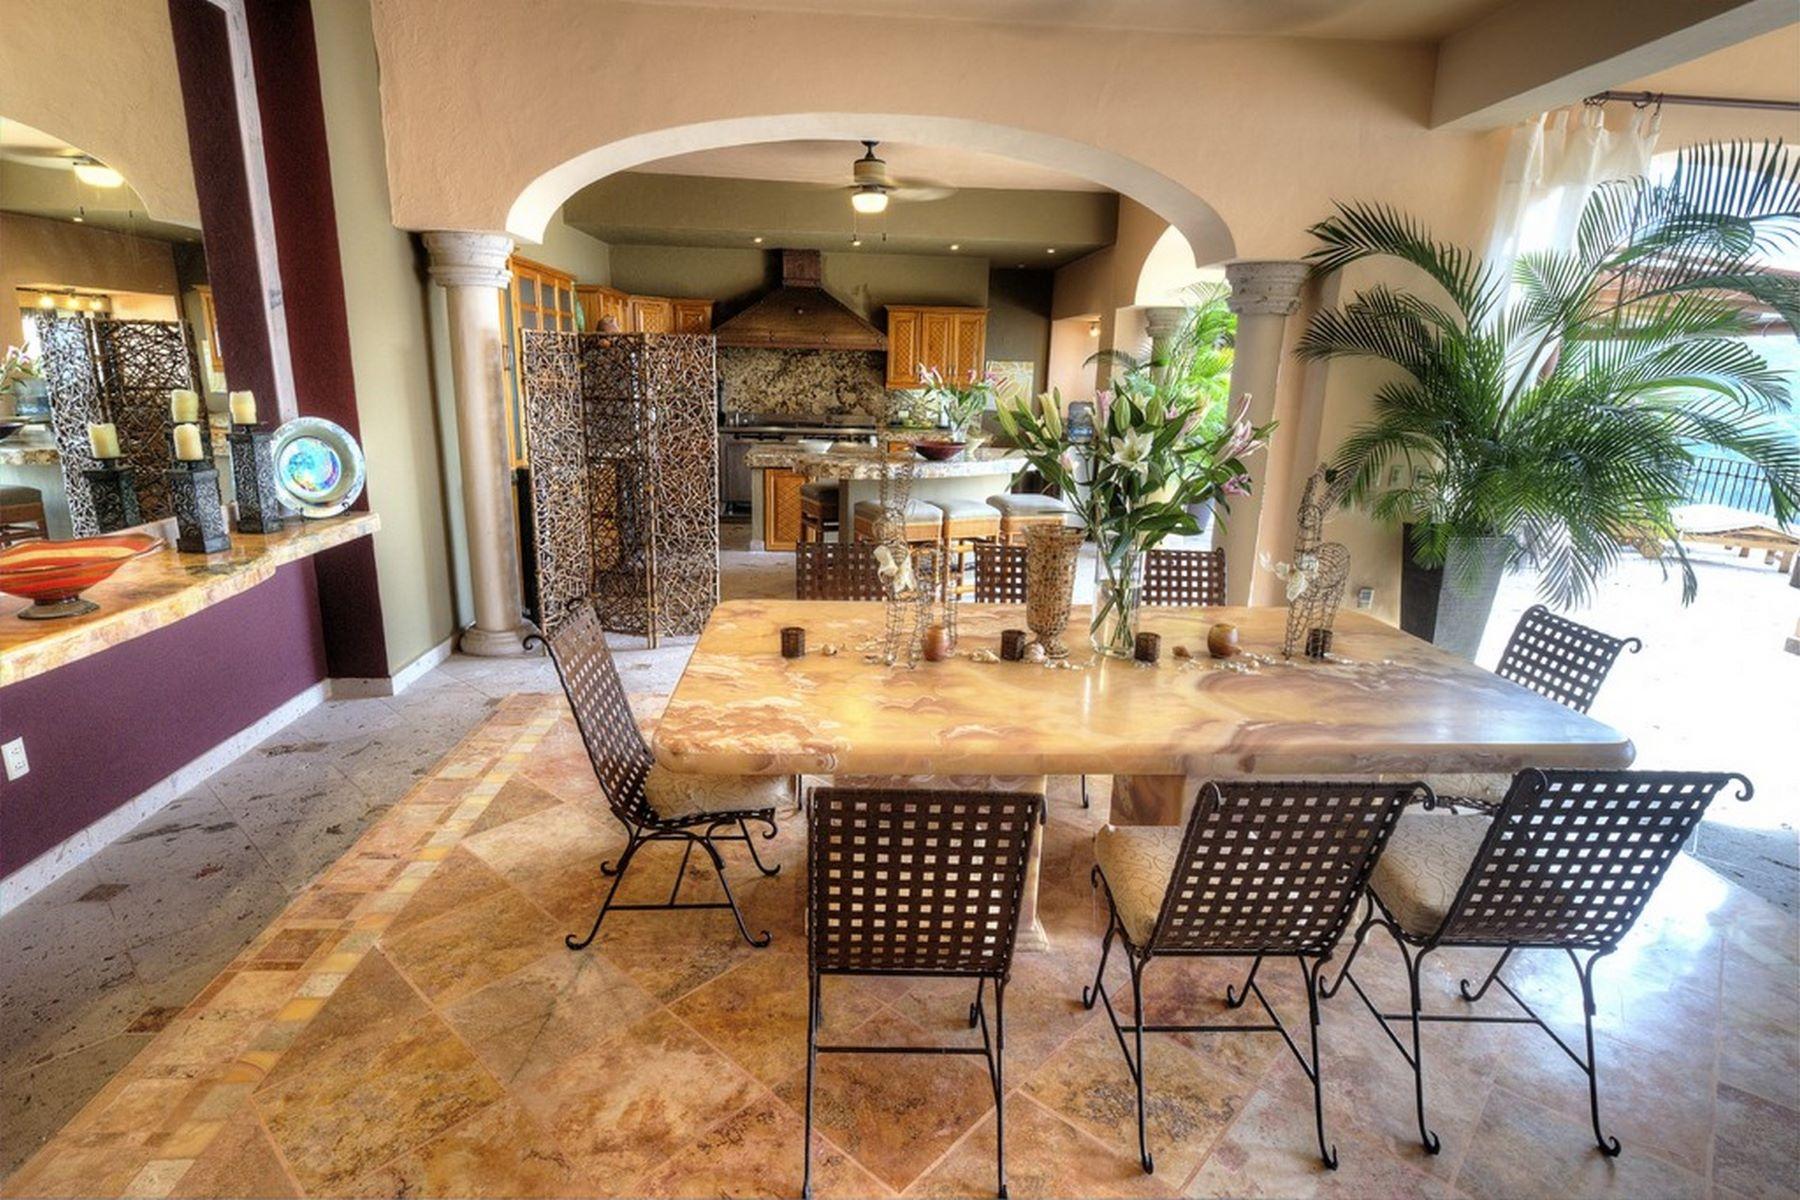 Additional photo for property listing at Villa Suzannah Candida Azucena 94 Lomas de Mismaloya Puerto Vallarta, Jalisco 48294 Mexico